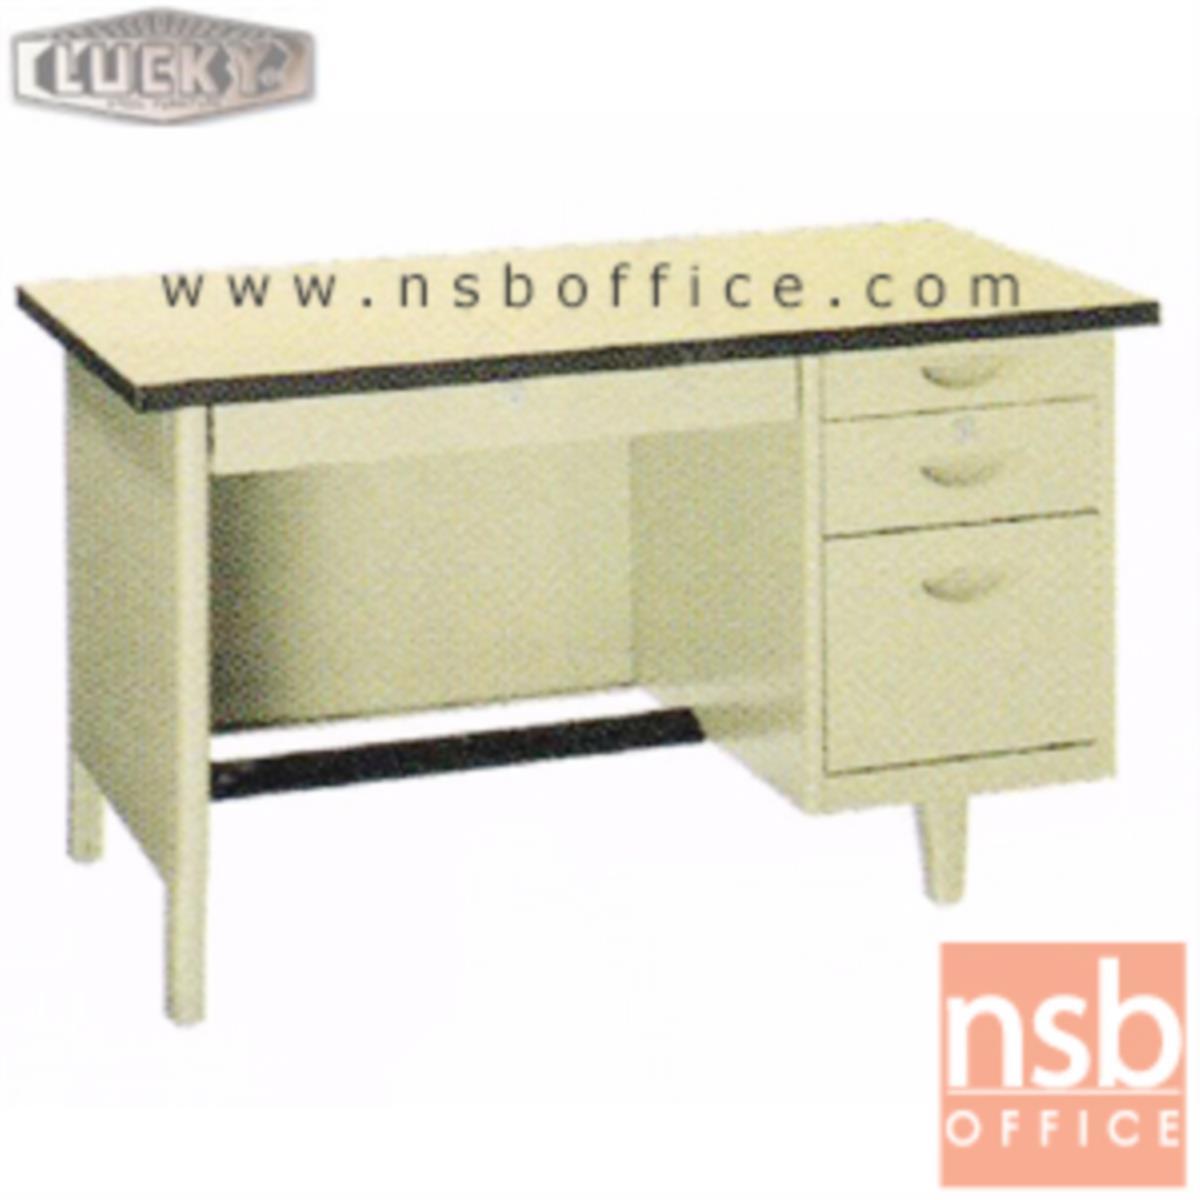 E28A102:โต๊ะทำงานเหล็กหน้าโฟเมก้า 4 ลิ้นชัก   รุ่น NTN-2436,NTN-2642,NTN-2648 ยี่ห้อ Lucky